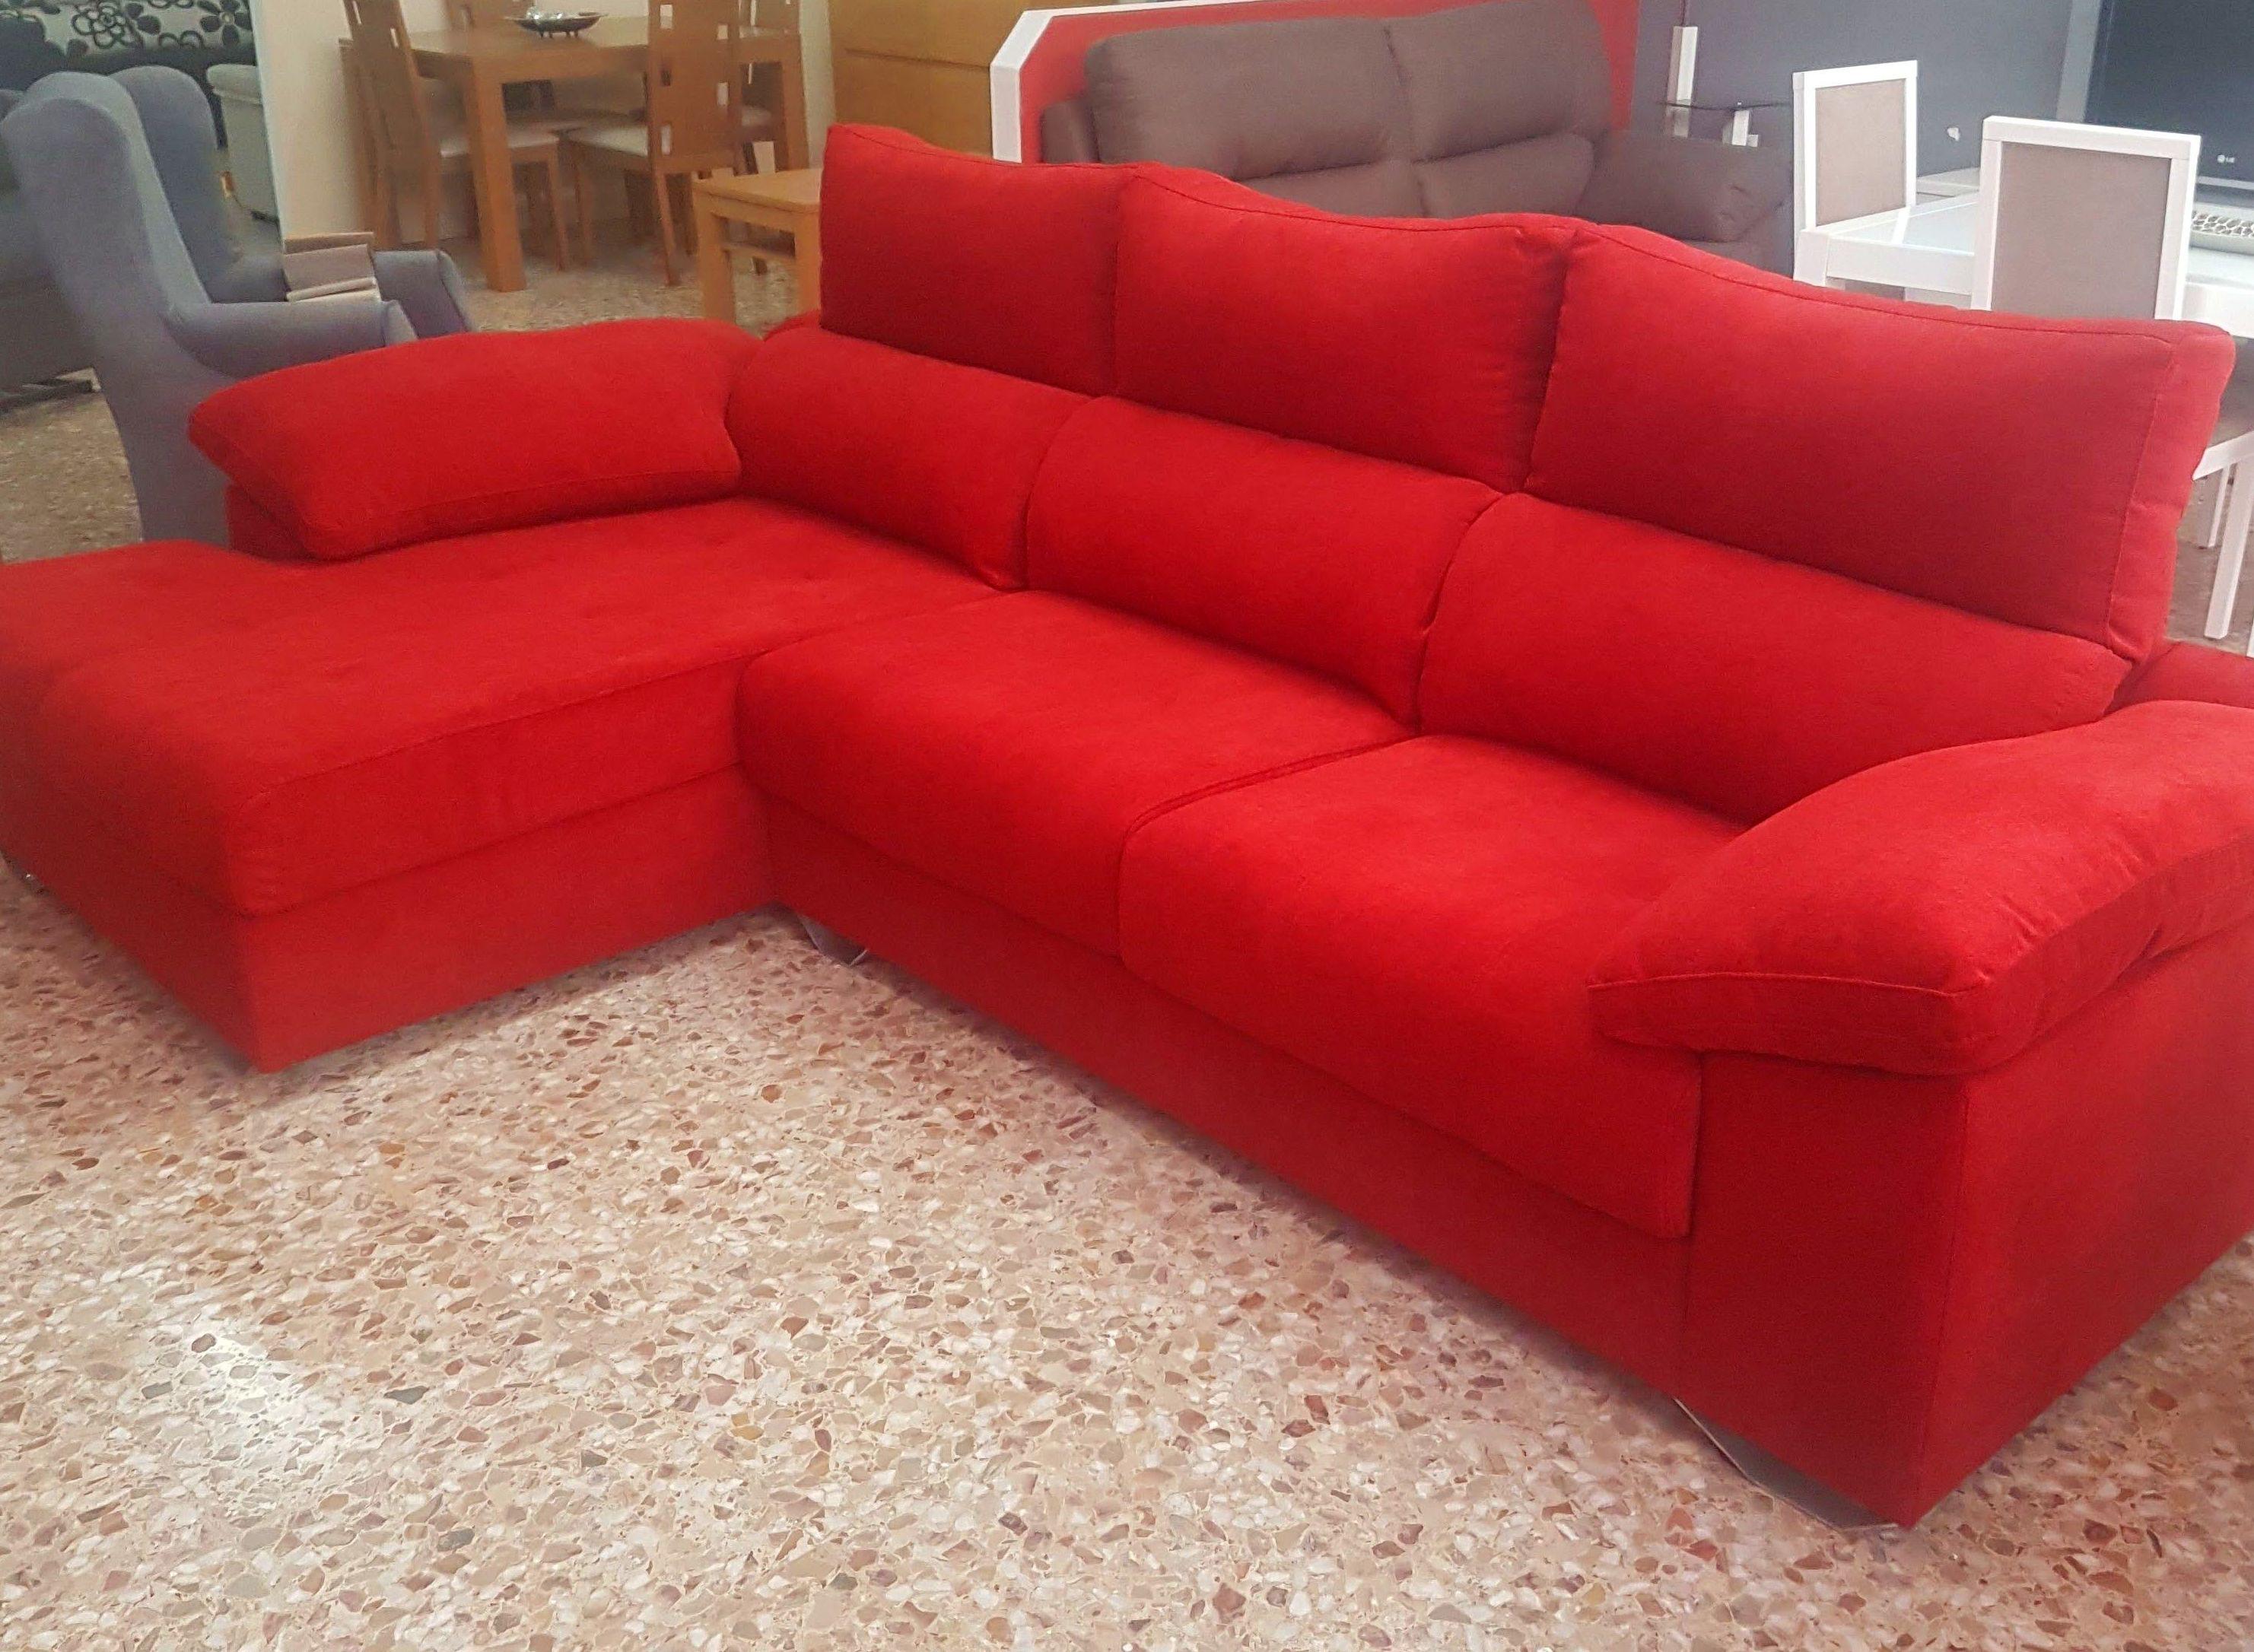 chaiselongue roja : Productos  de Muebles Llueca, S. L.